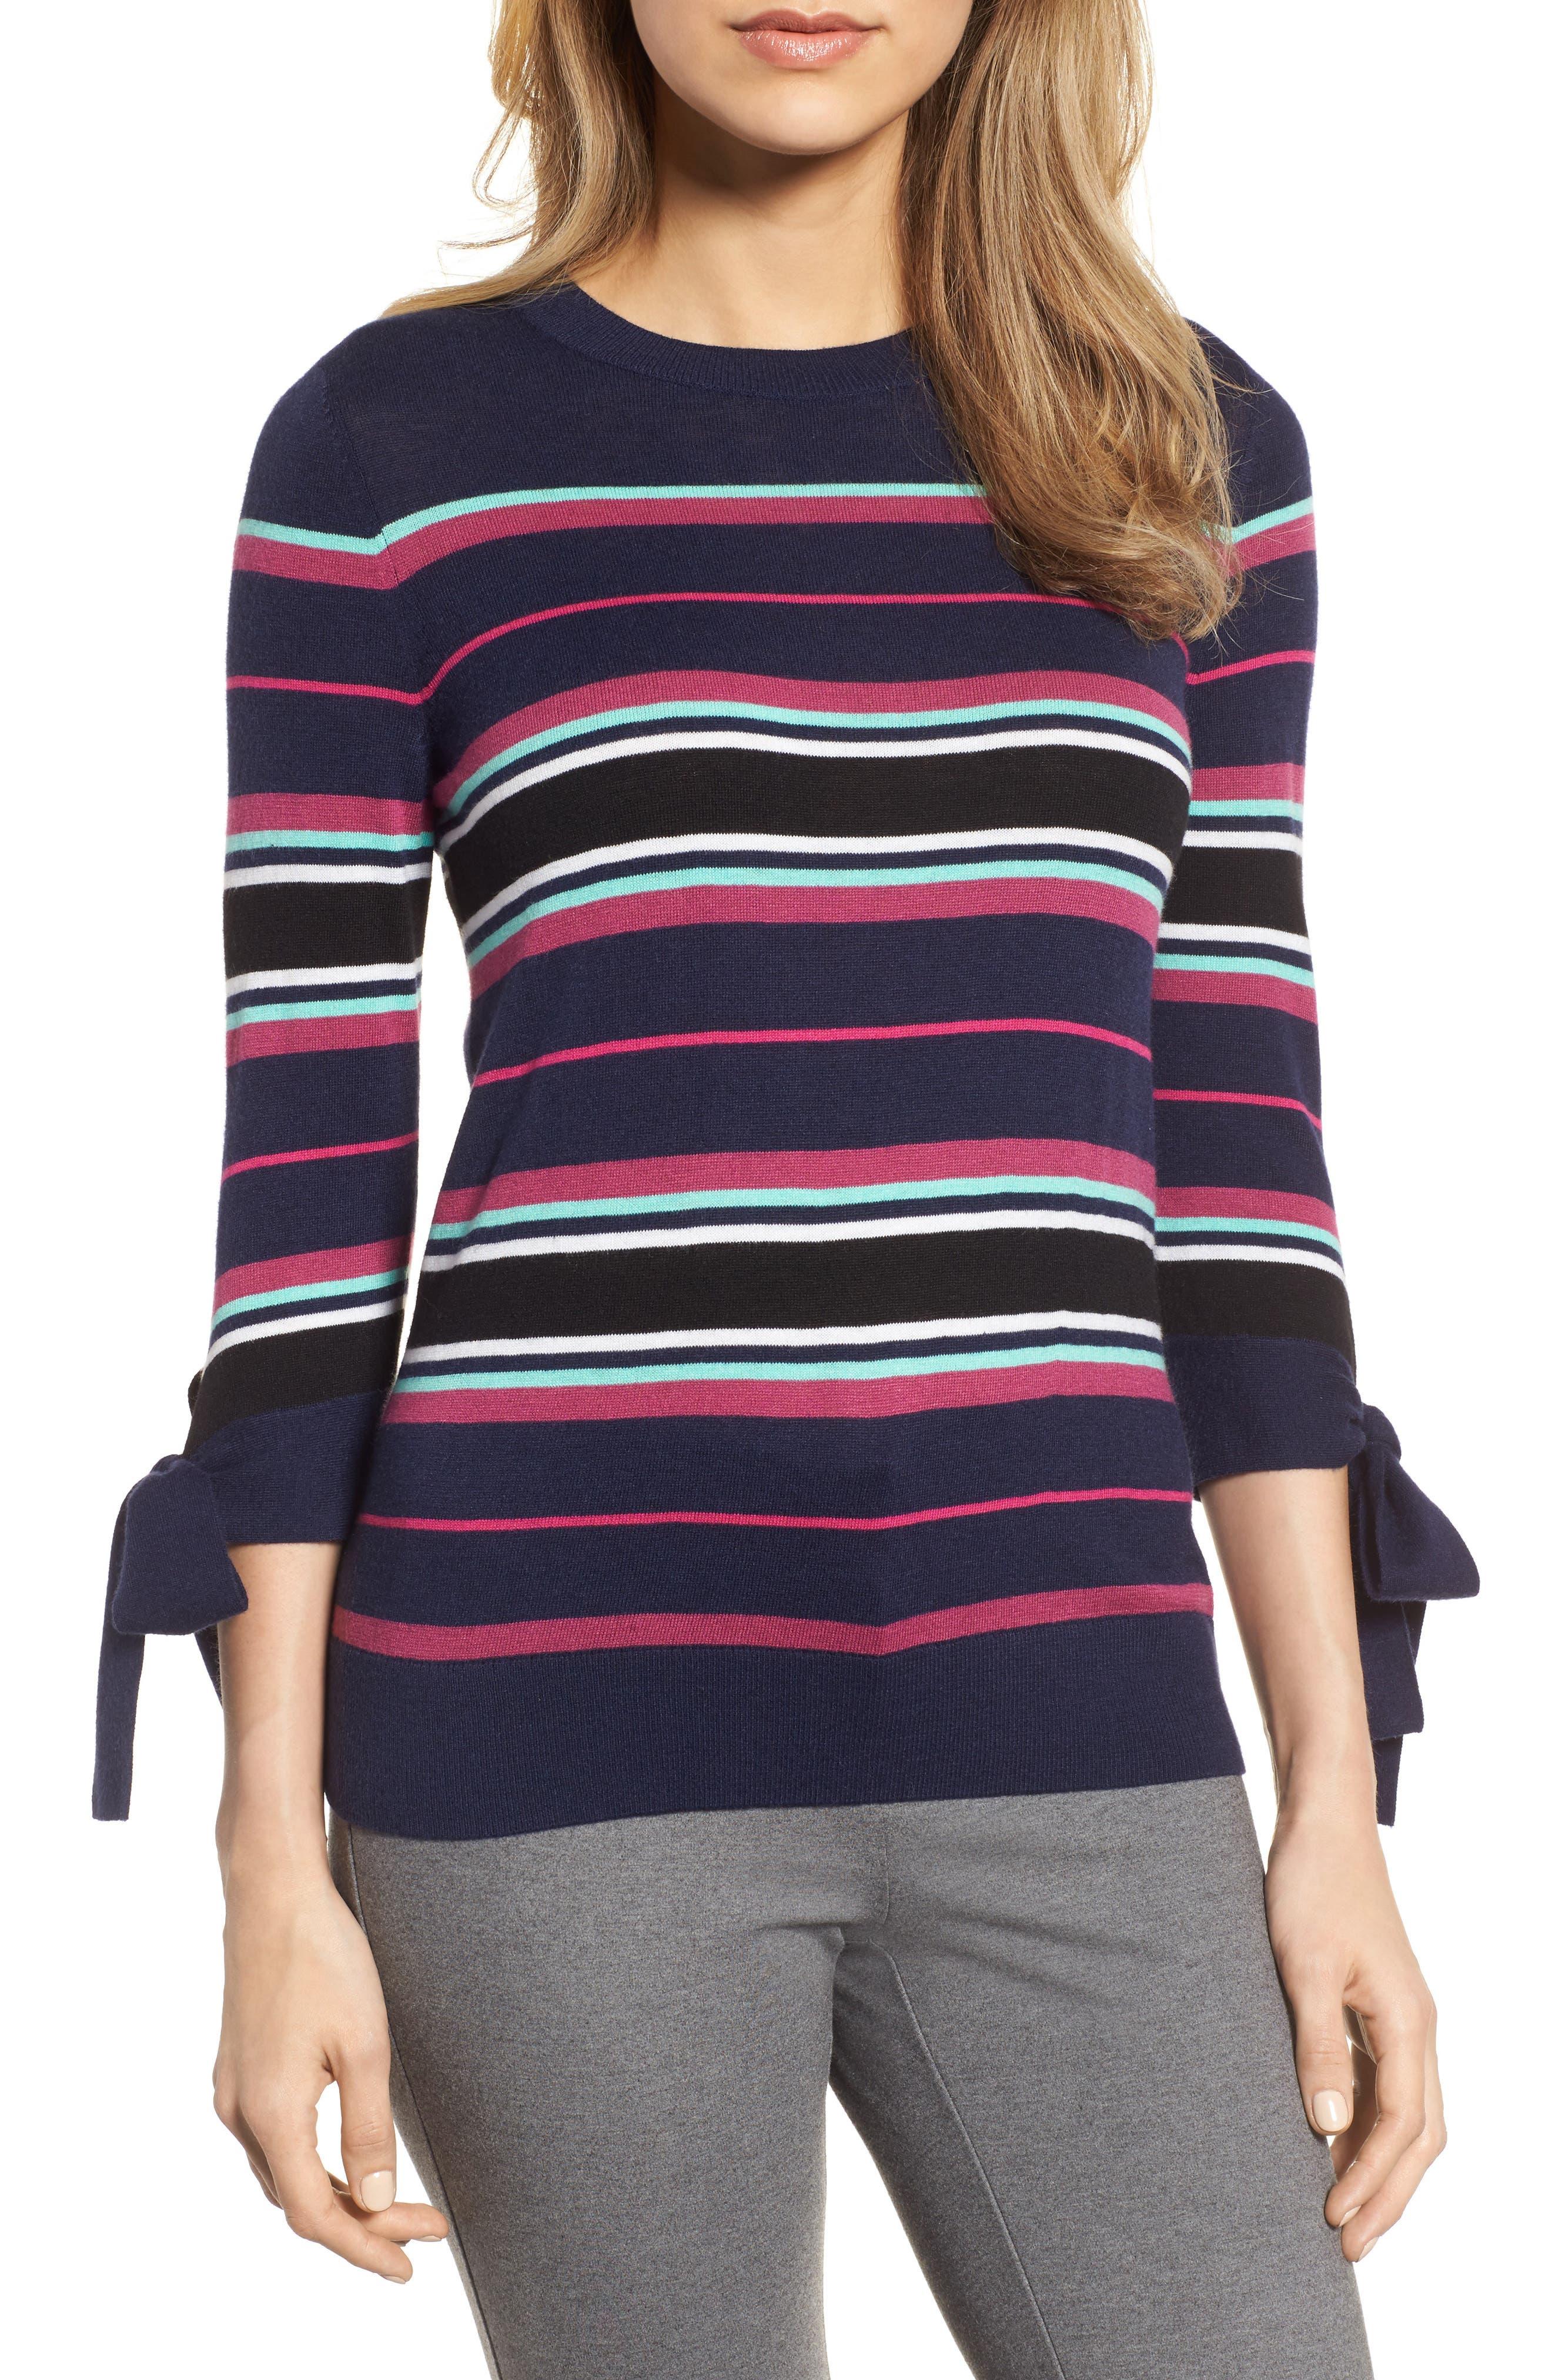 Tie Sleeve Crewneck Sweater,                             Main thumbnail 1, color,                             Navy/ Pink Multi Stripe